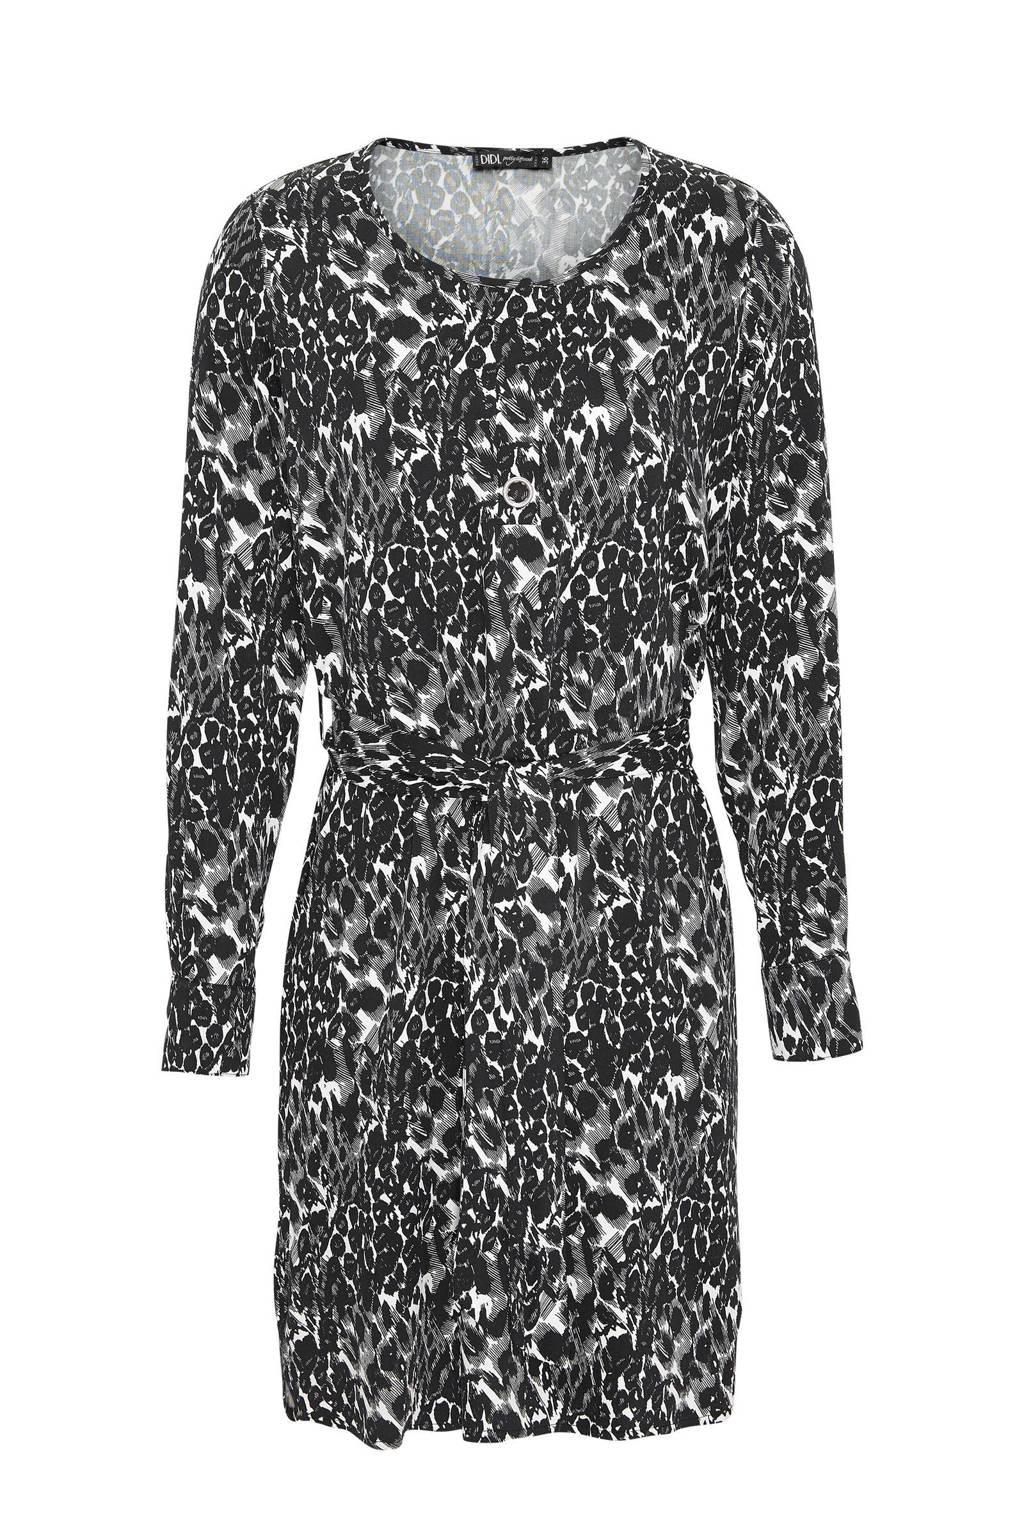 Didi blousejurk met all over print zwart, Zwart